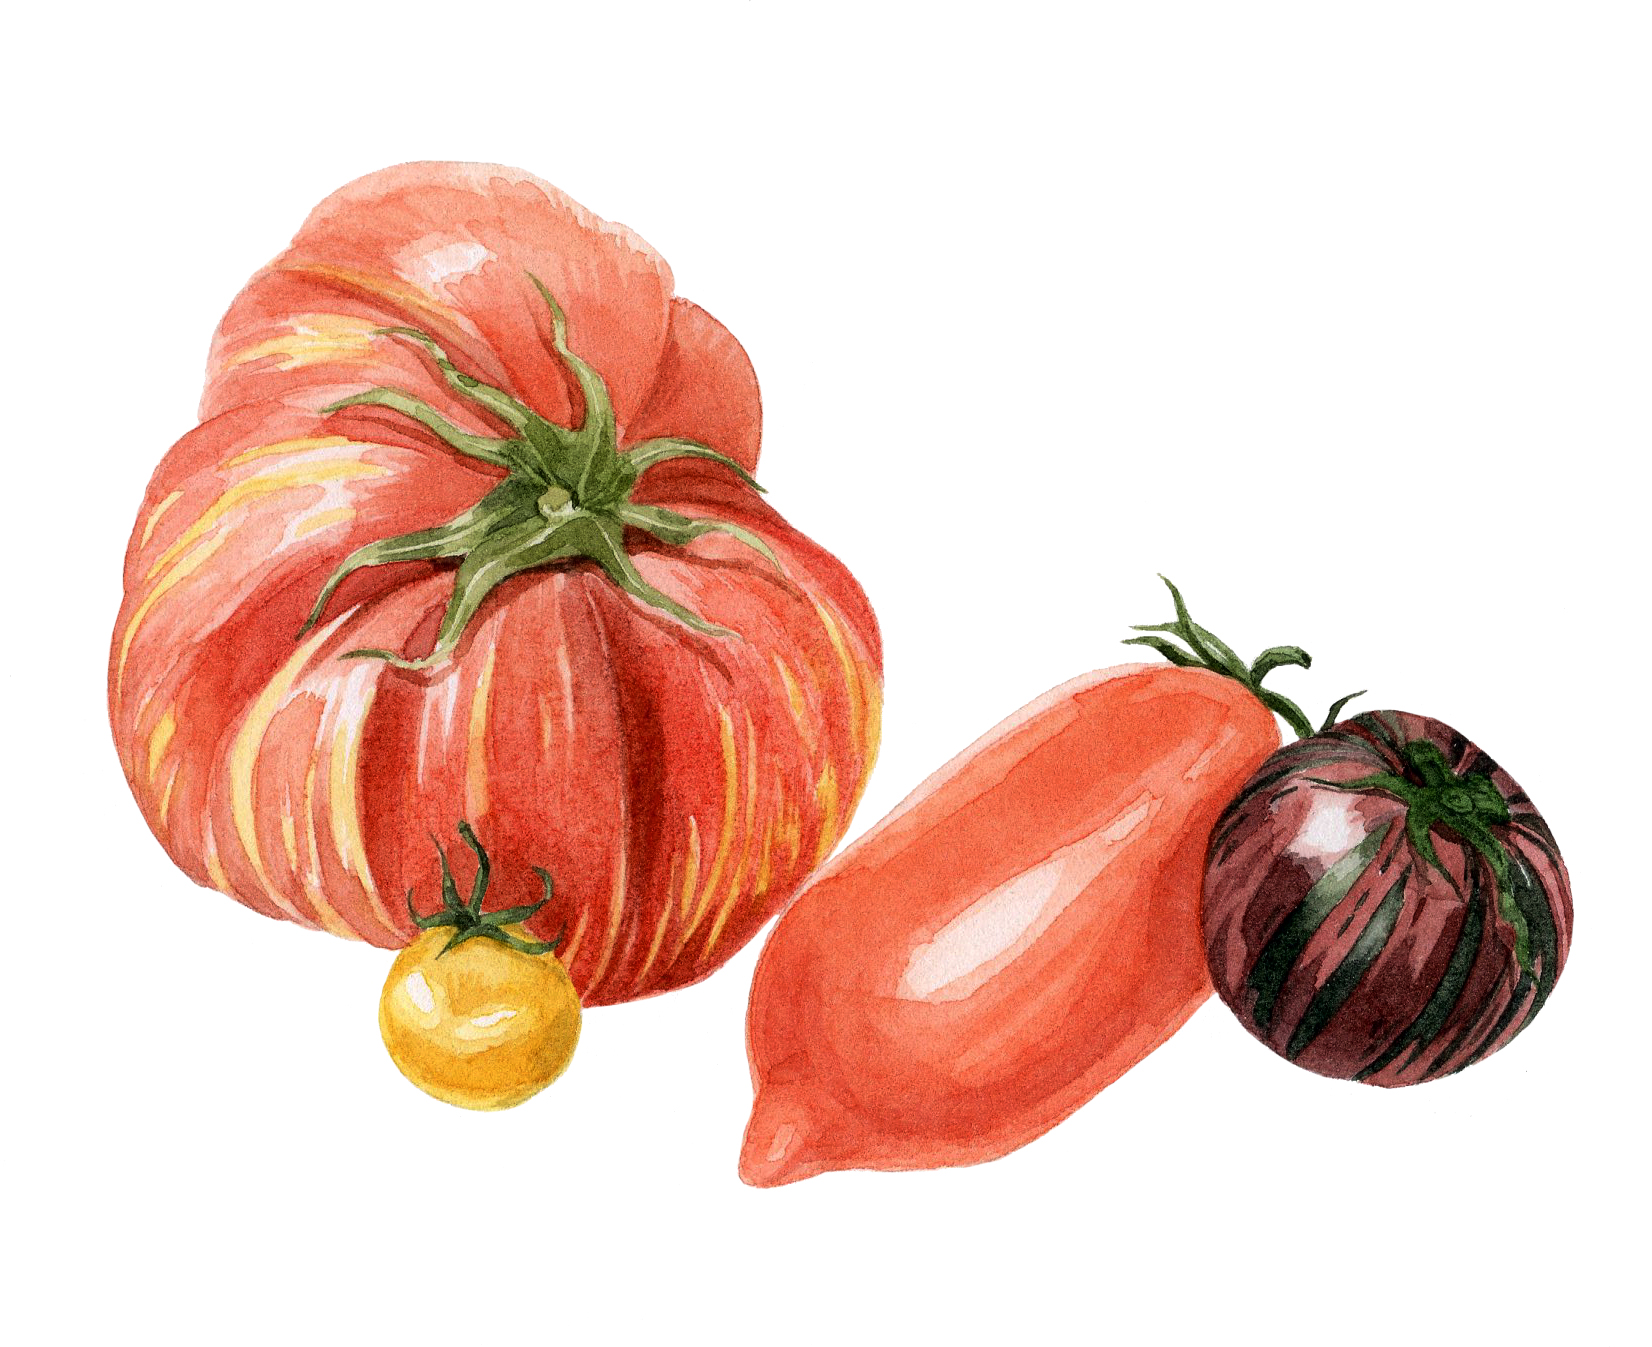 10-tomatoes.jpg